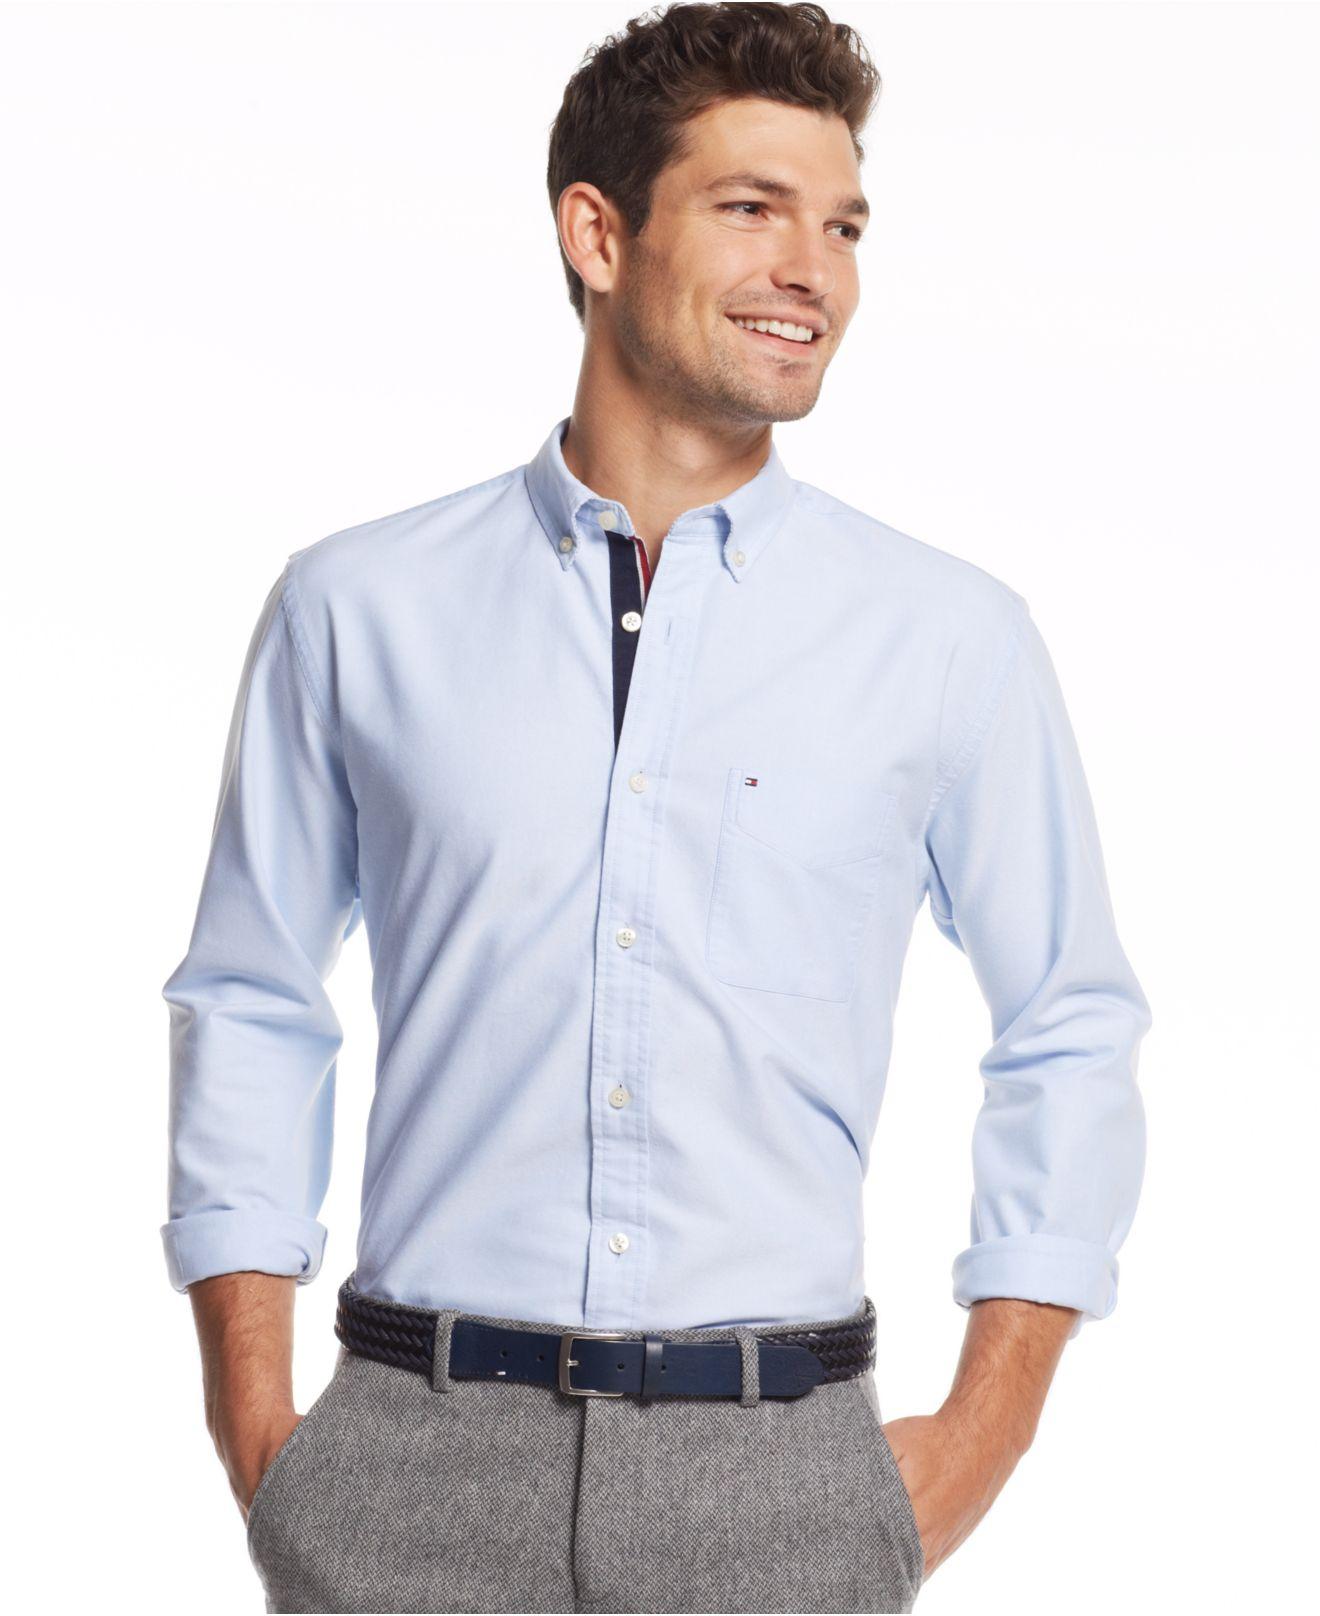 White Stripe Custom Fit TOMMY HILFIGER Shirt Men's Lightweight Oxford Blue